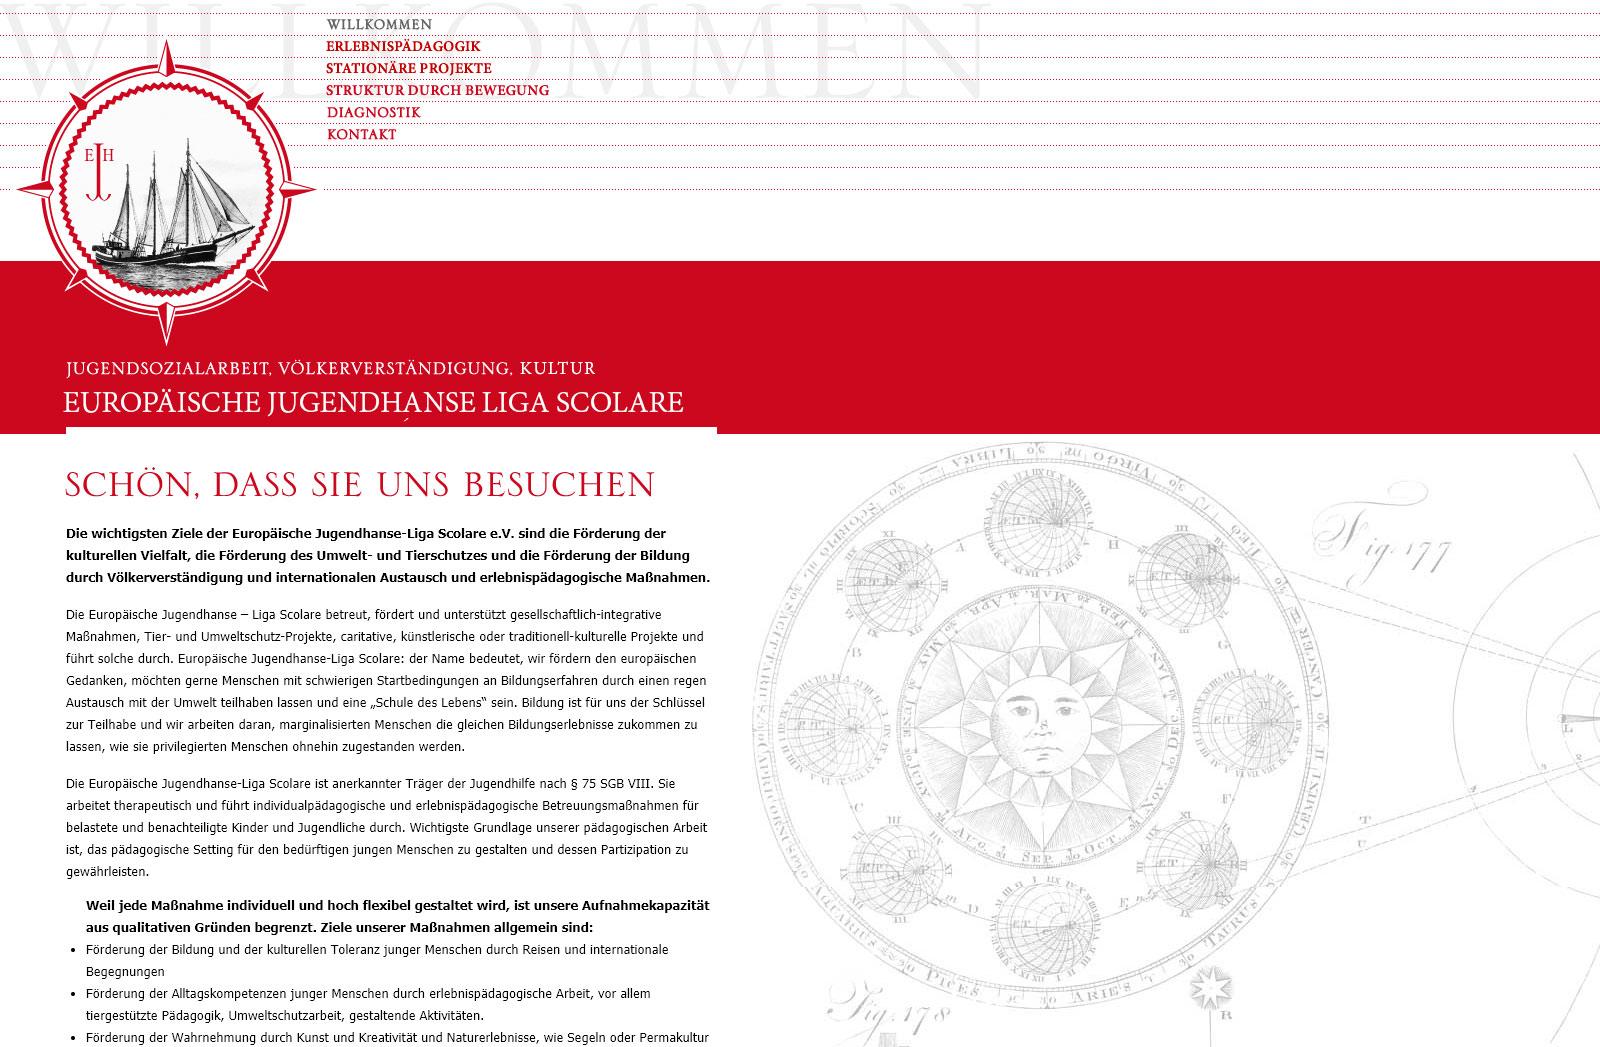 Europäische Jugendhanse Liga Scolare e. V – ZFD-Zeitfuerdesign.de ...